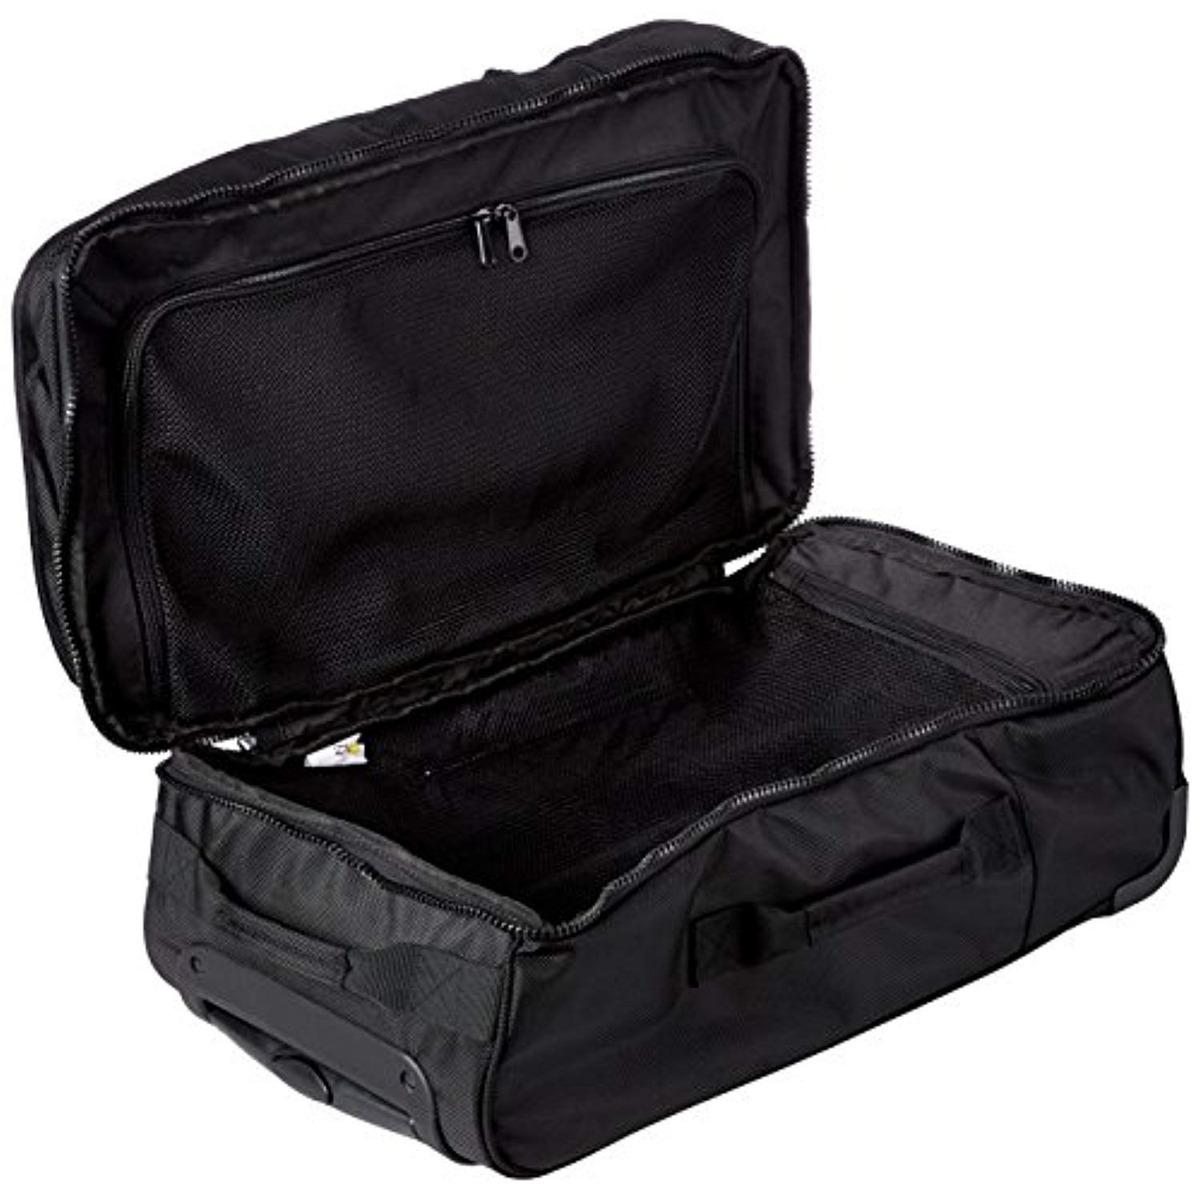 810bc8d6e8c9 Maletas Billabong Men S Booster Carry On Suitcase